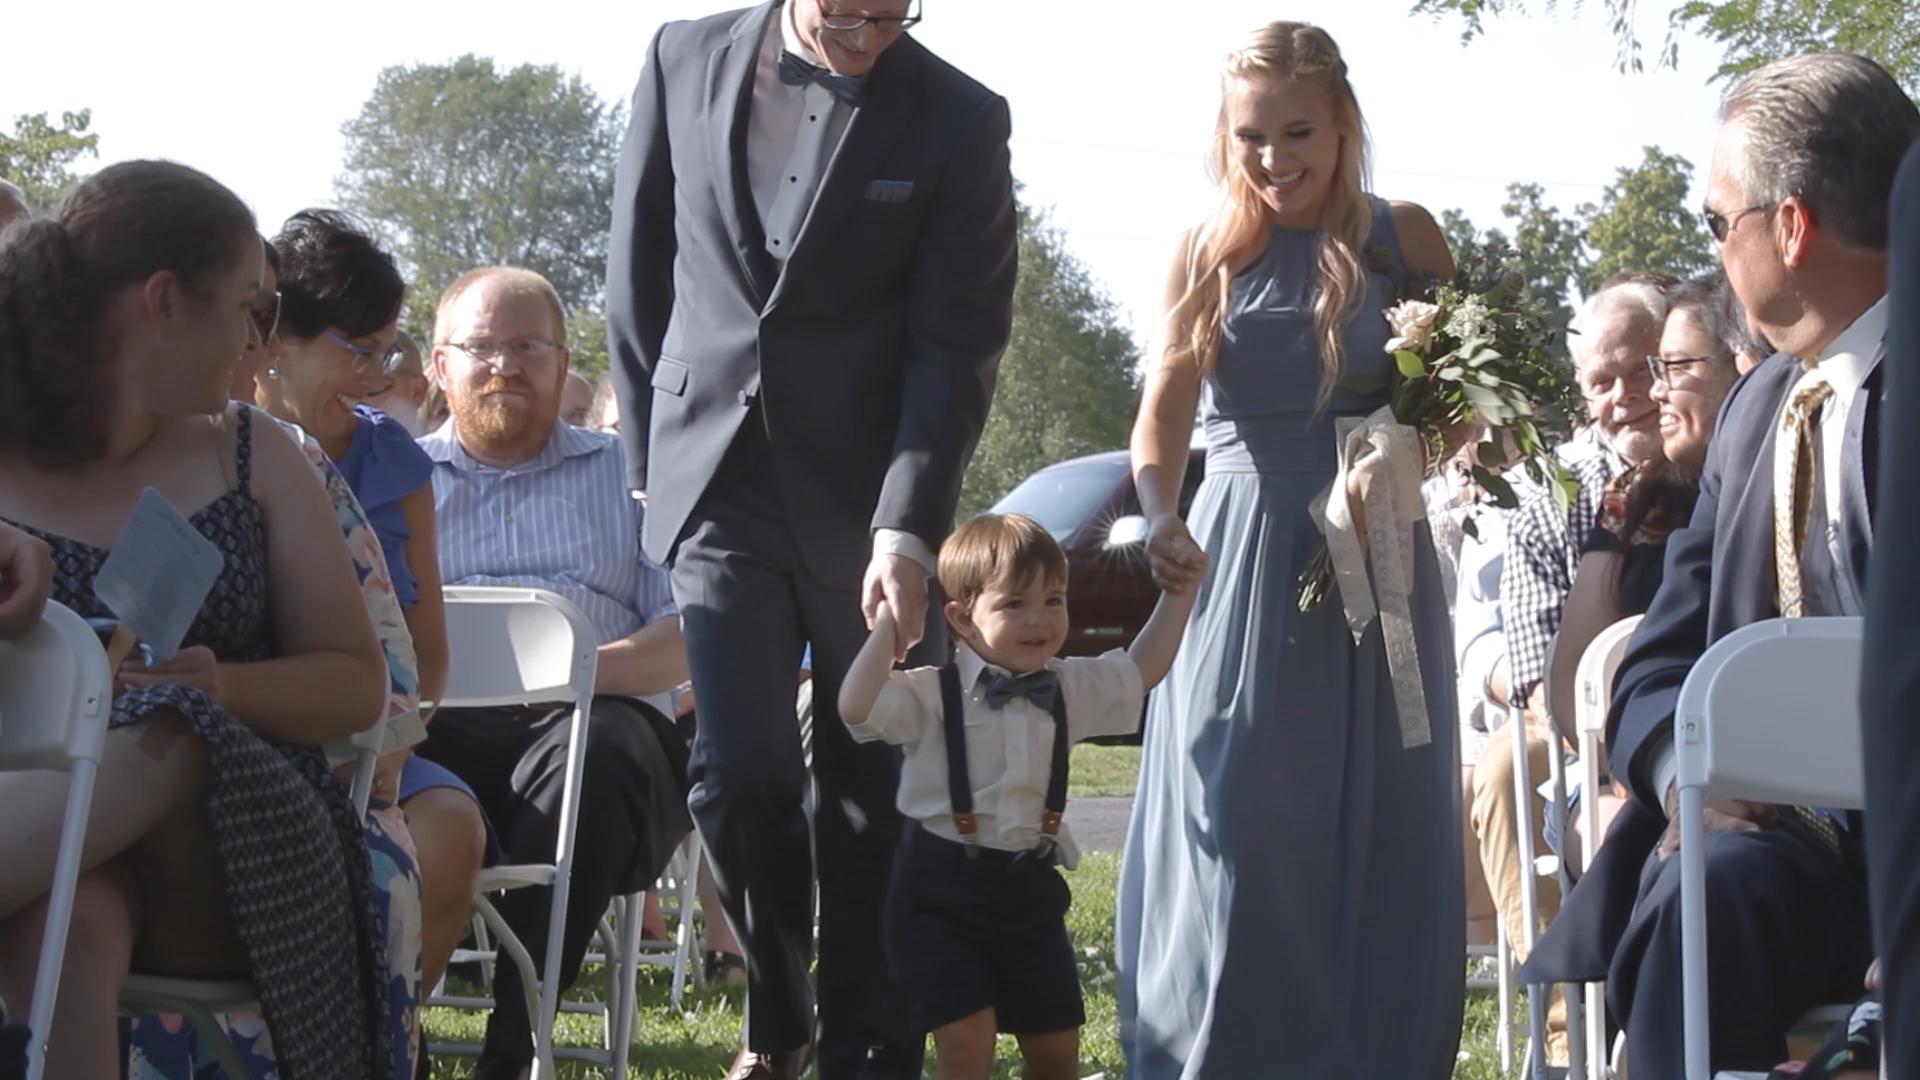 Wedding Sequence.00_02_53_11.Still010.png